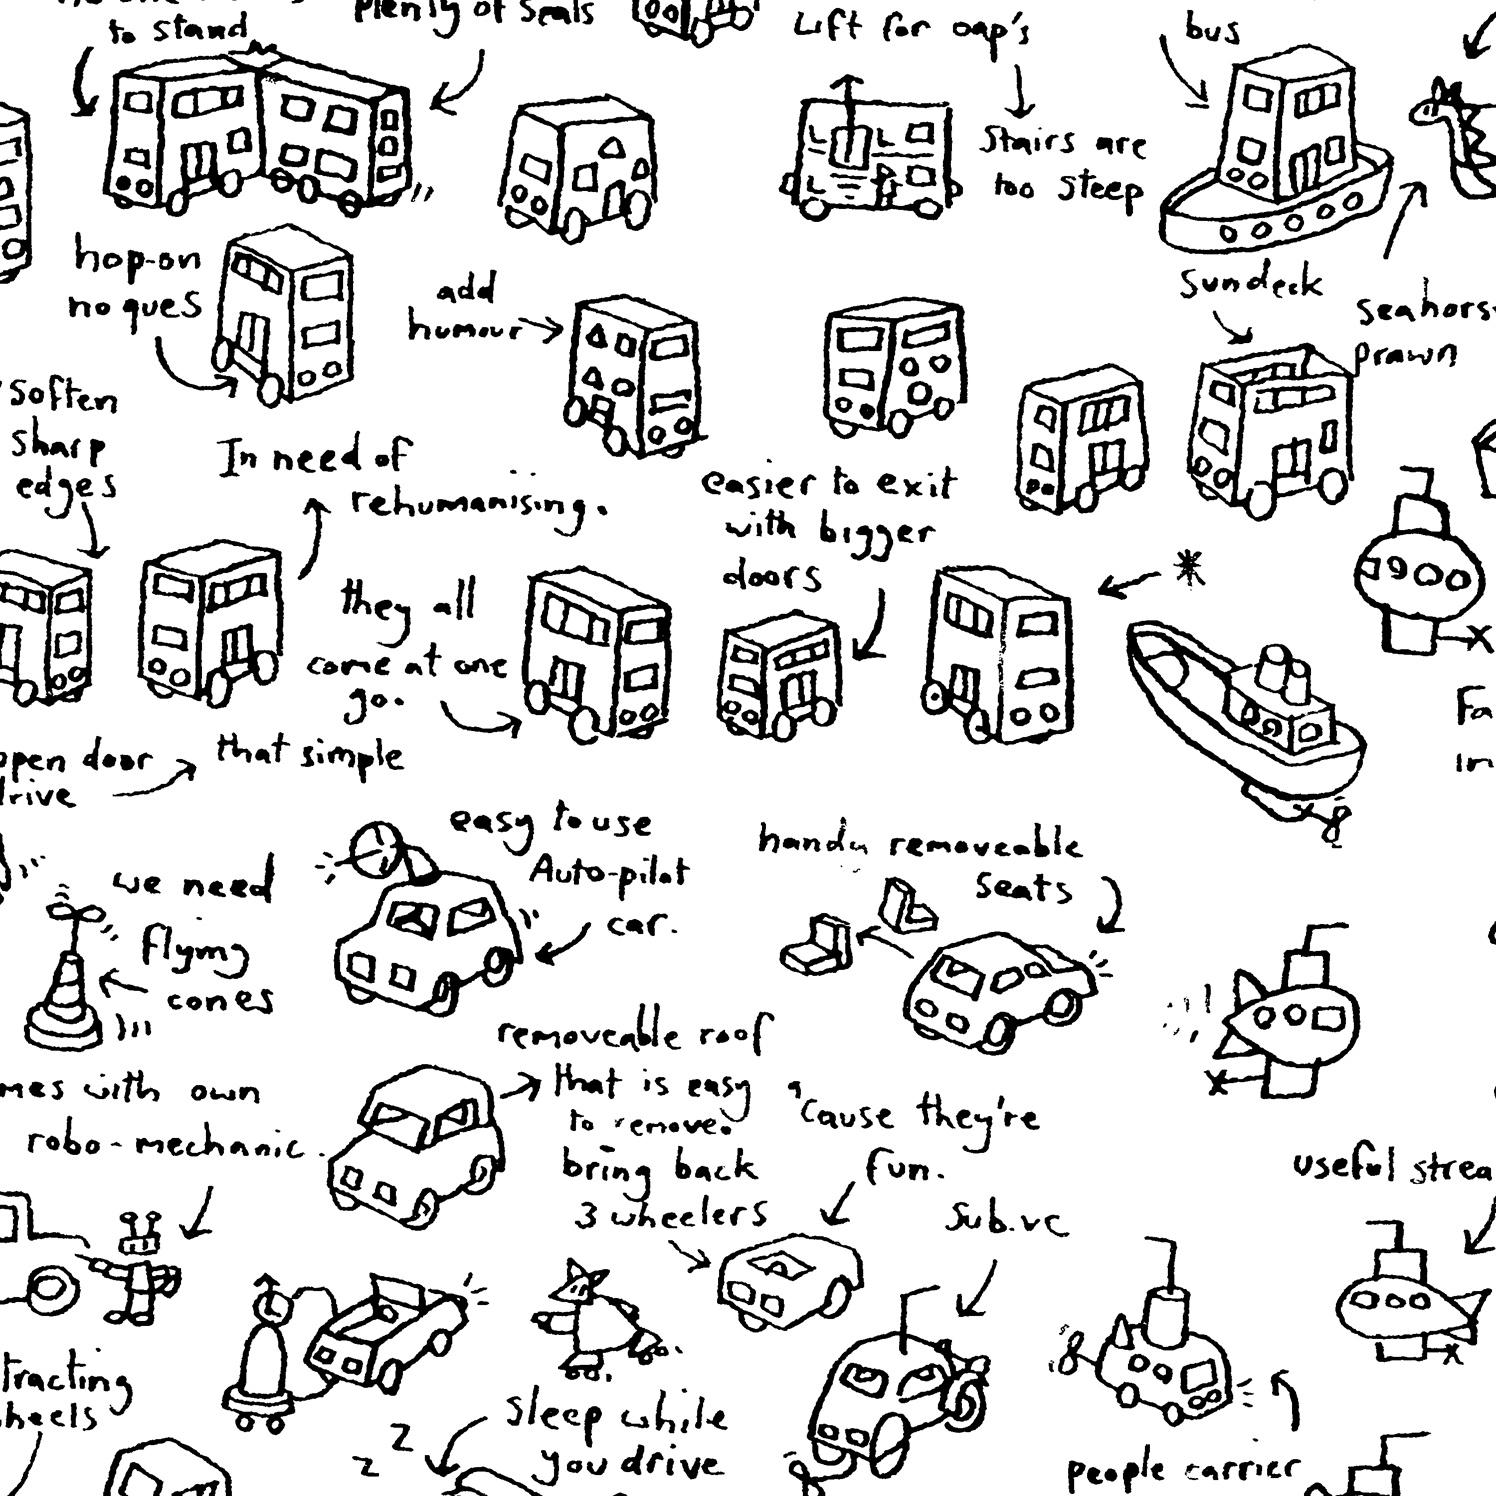 Brainstorm Hand Drawn London Buses